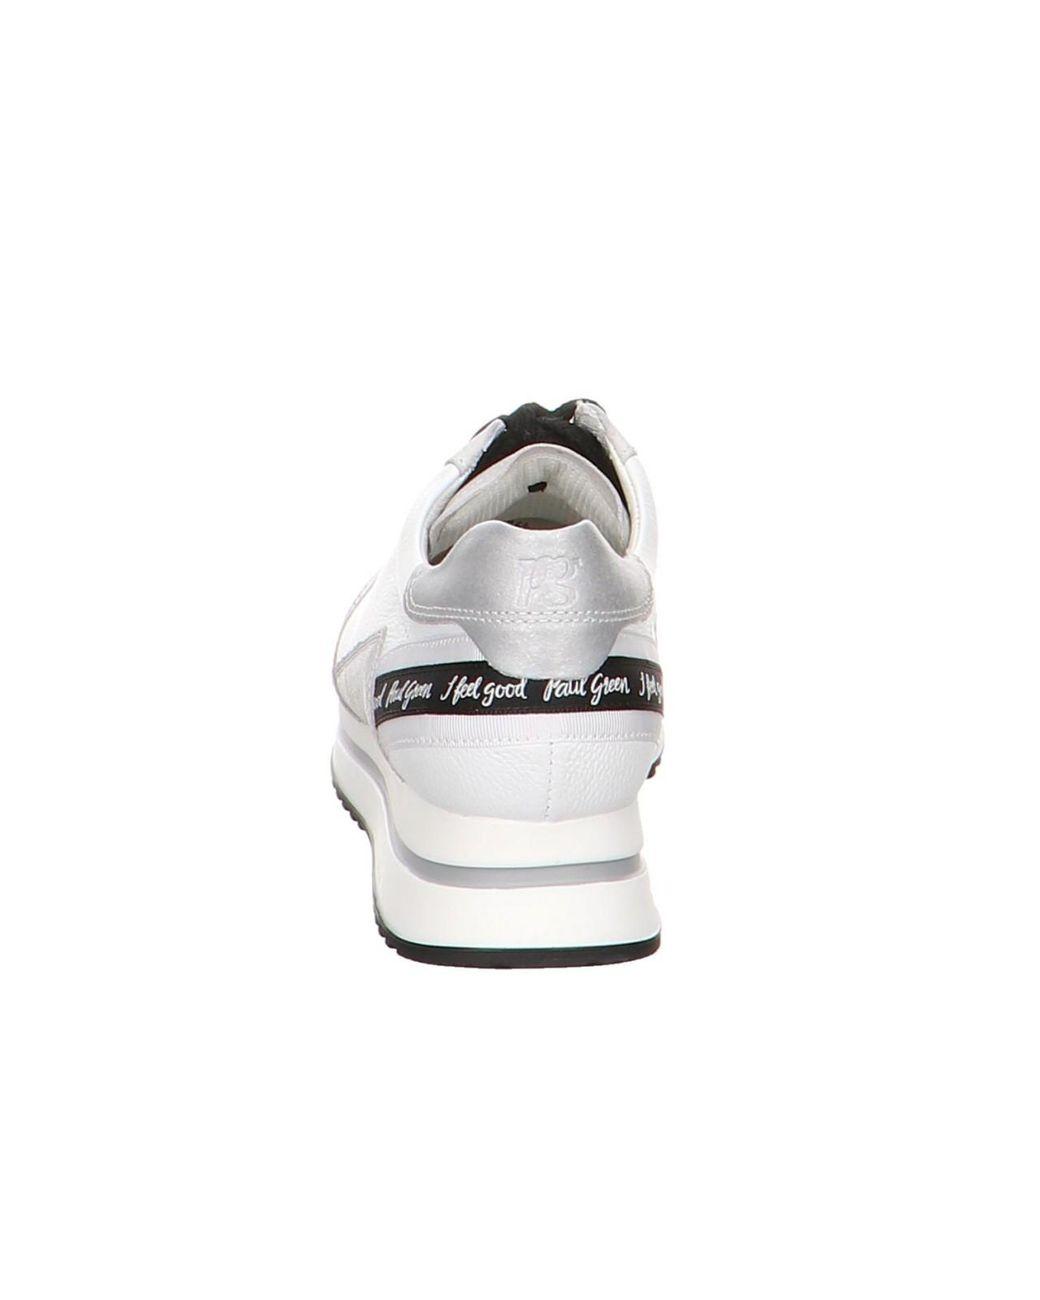 heiß-verkaufender Beamter am besten billig Weg sparen Paul Green Wo Trainers White 0064-4791-004/sneaker 4791-004 ...